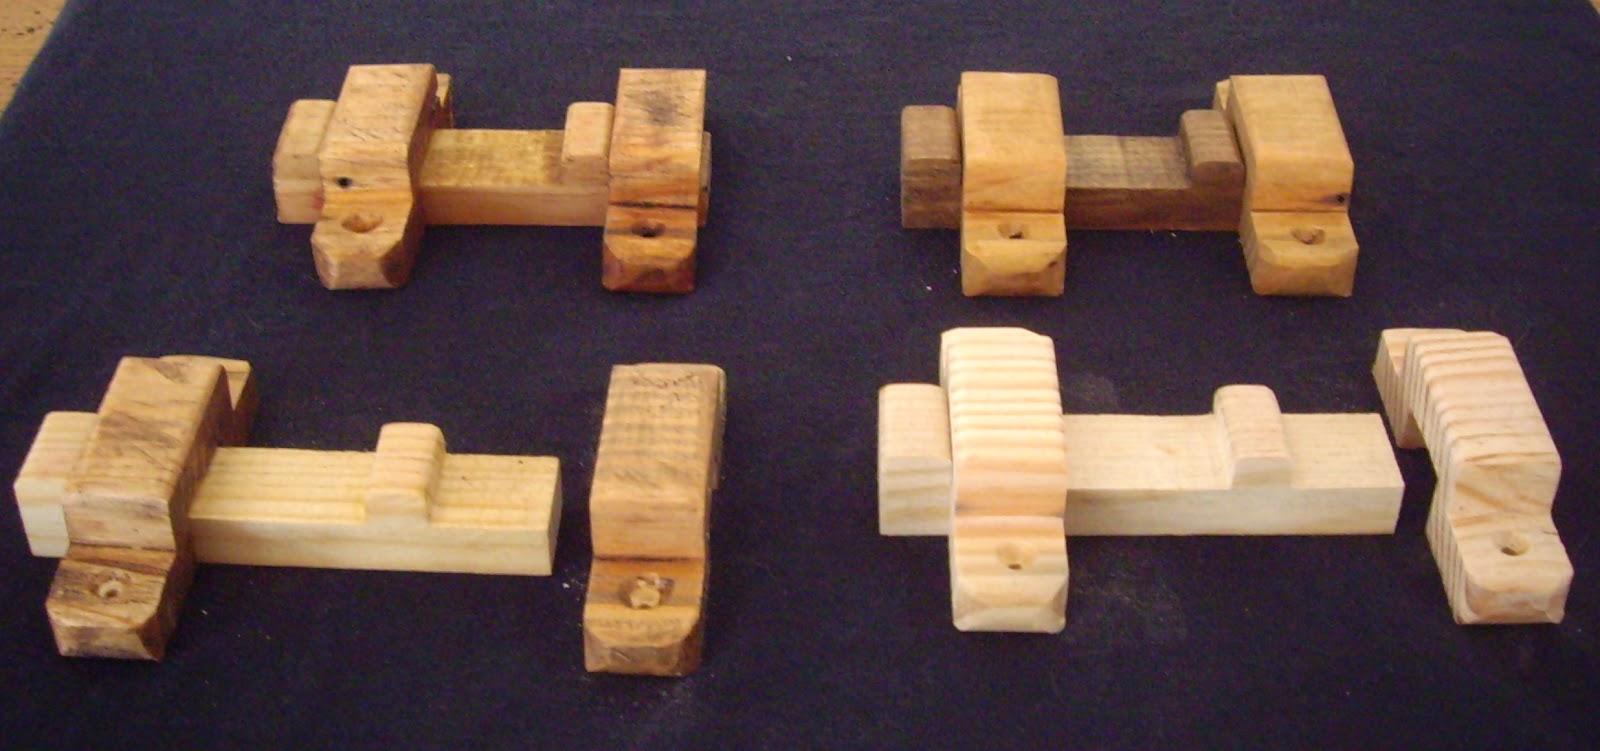 Objets d co tutoriels et meubles en bois de palettes targette verrou en bois - Objet en palette en bois ...